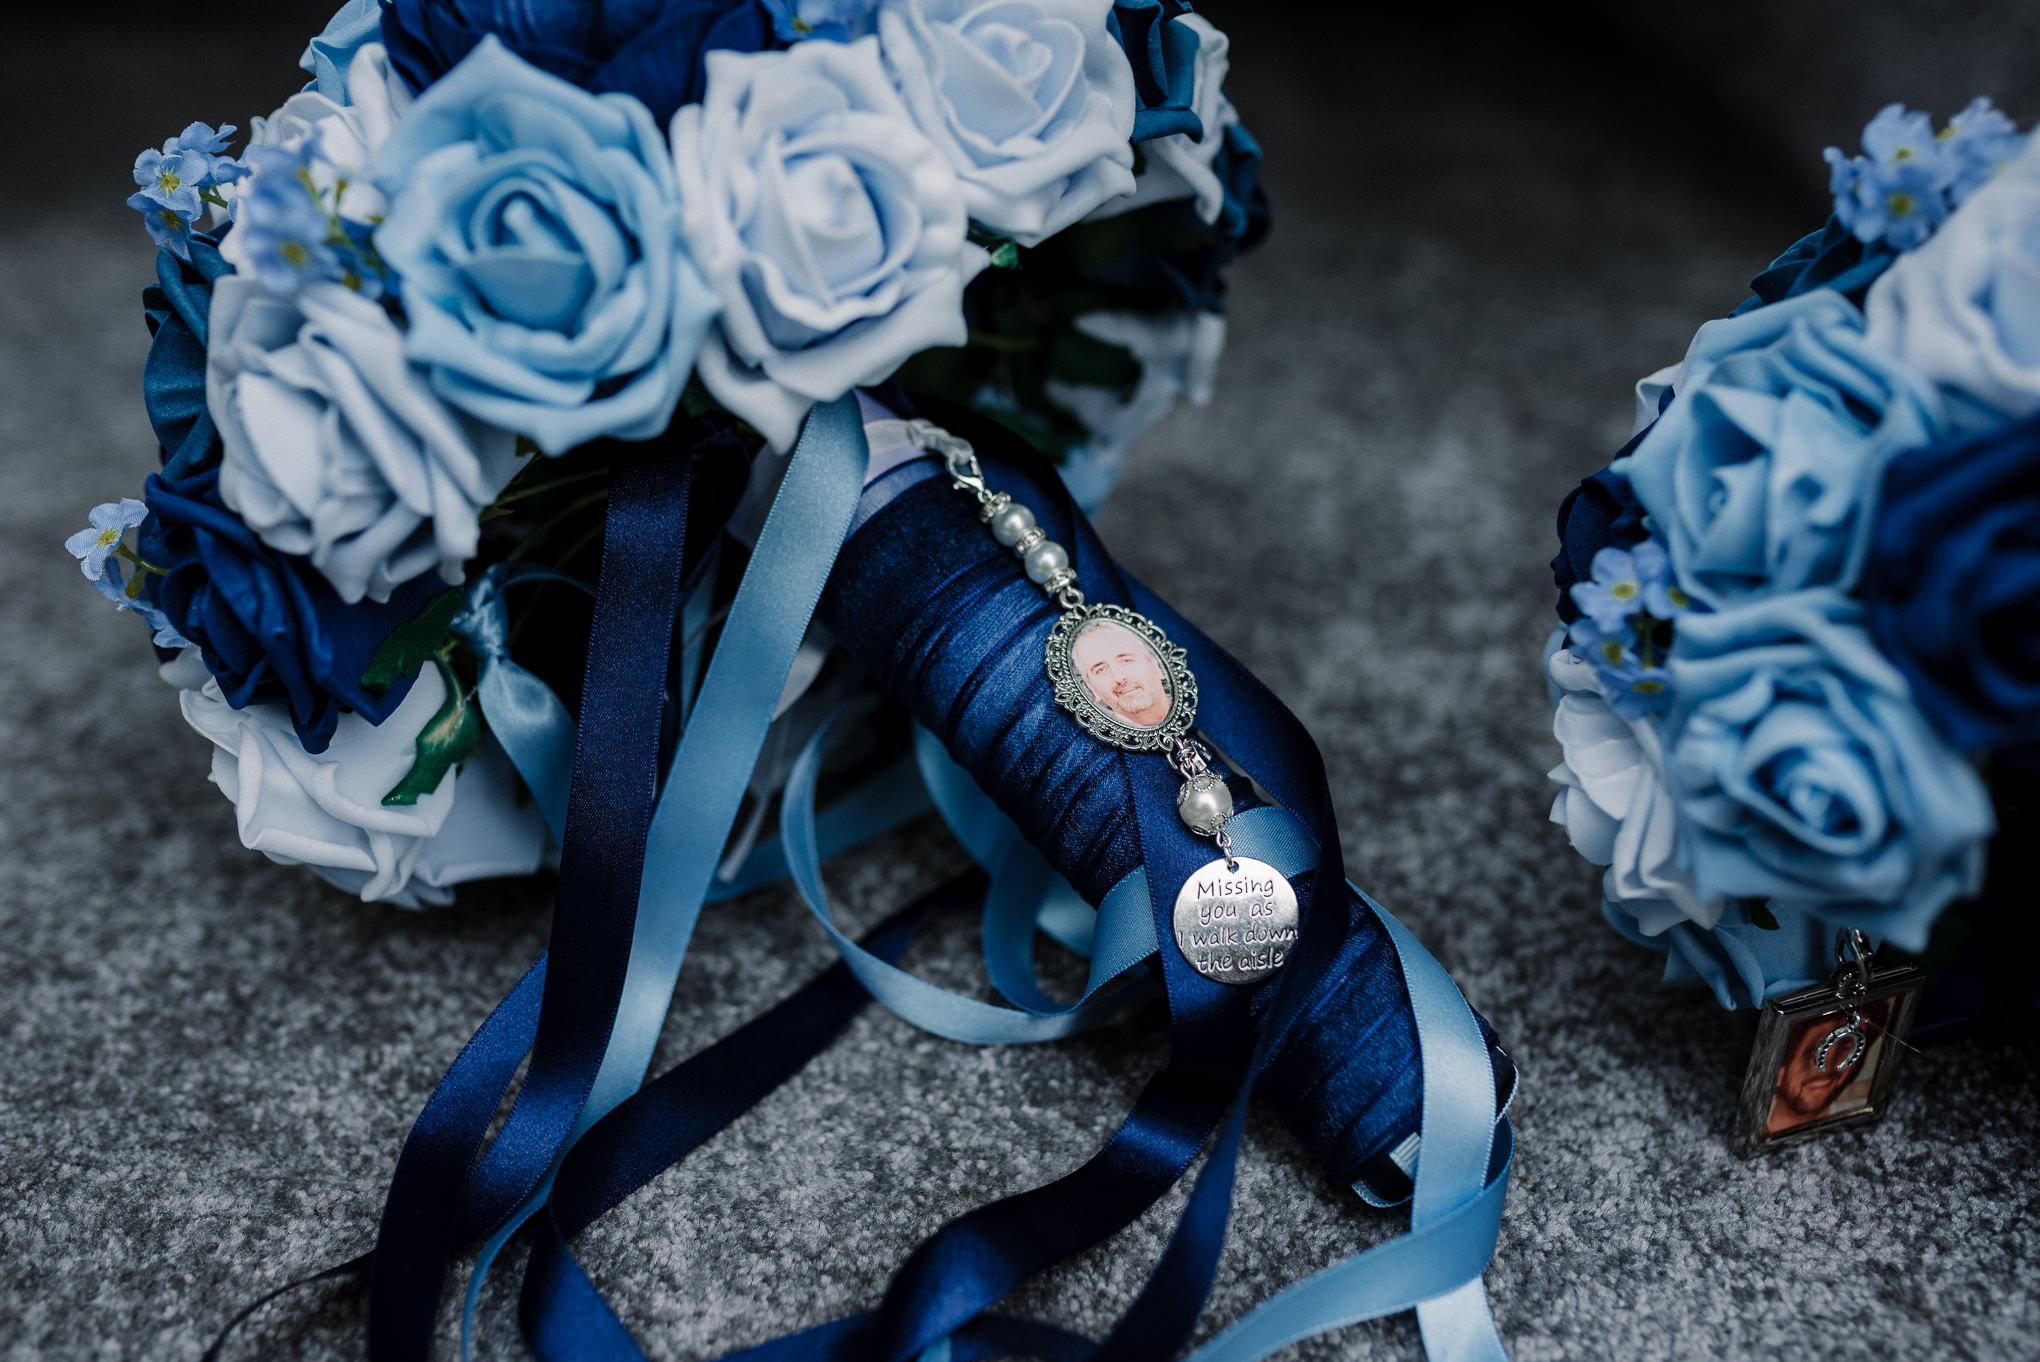 Detailed shot of the brides wedding bouquet.